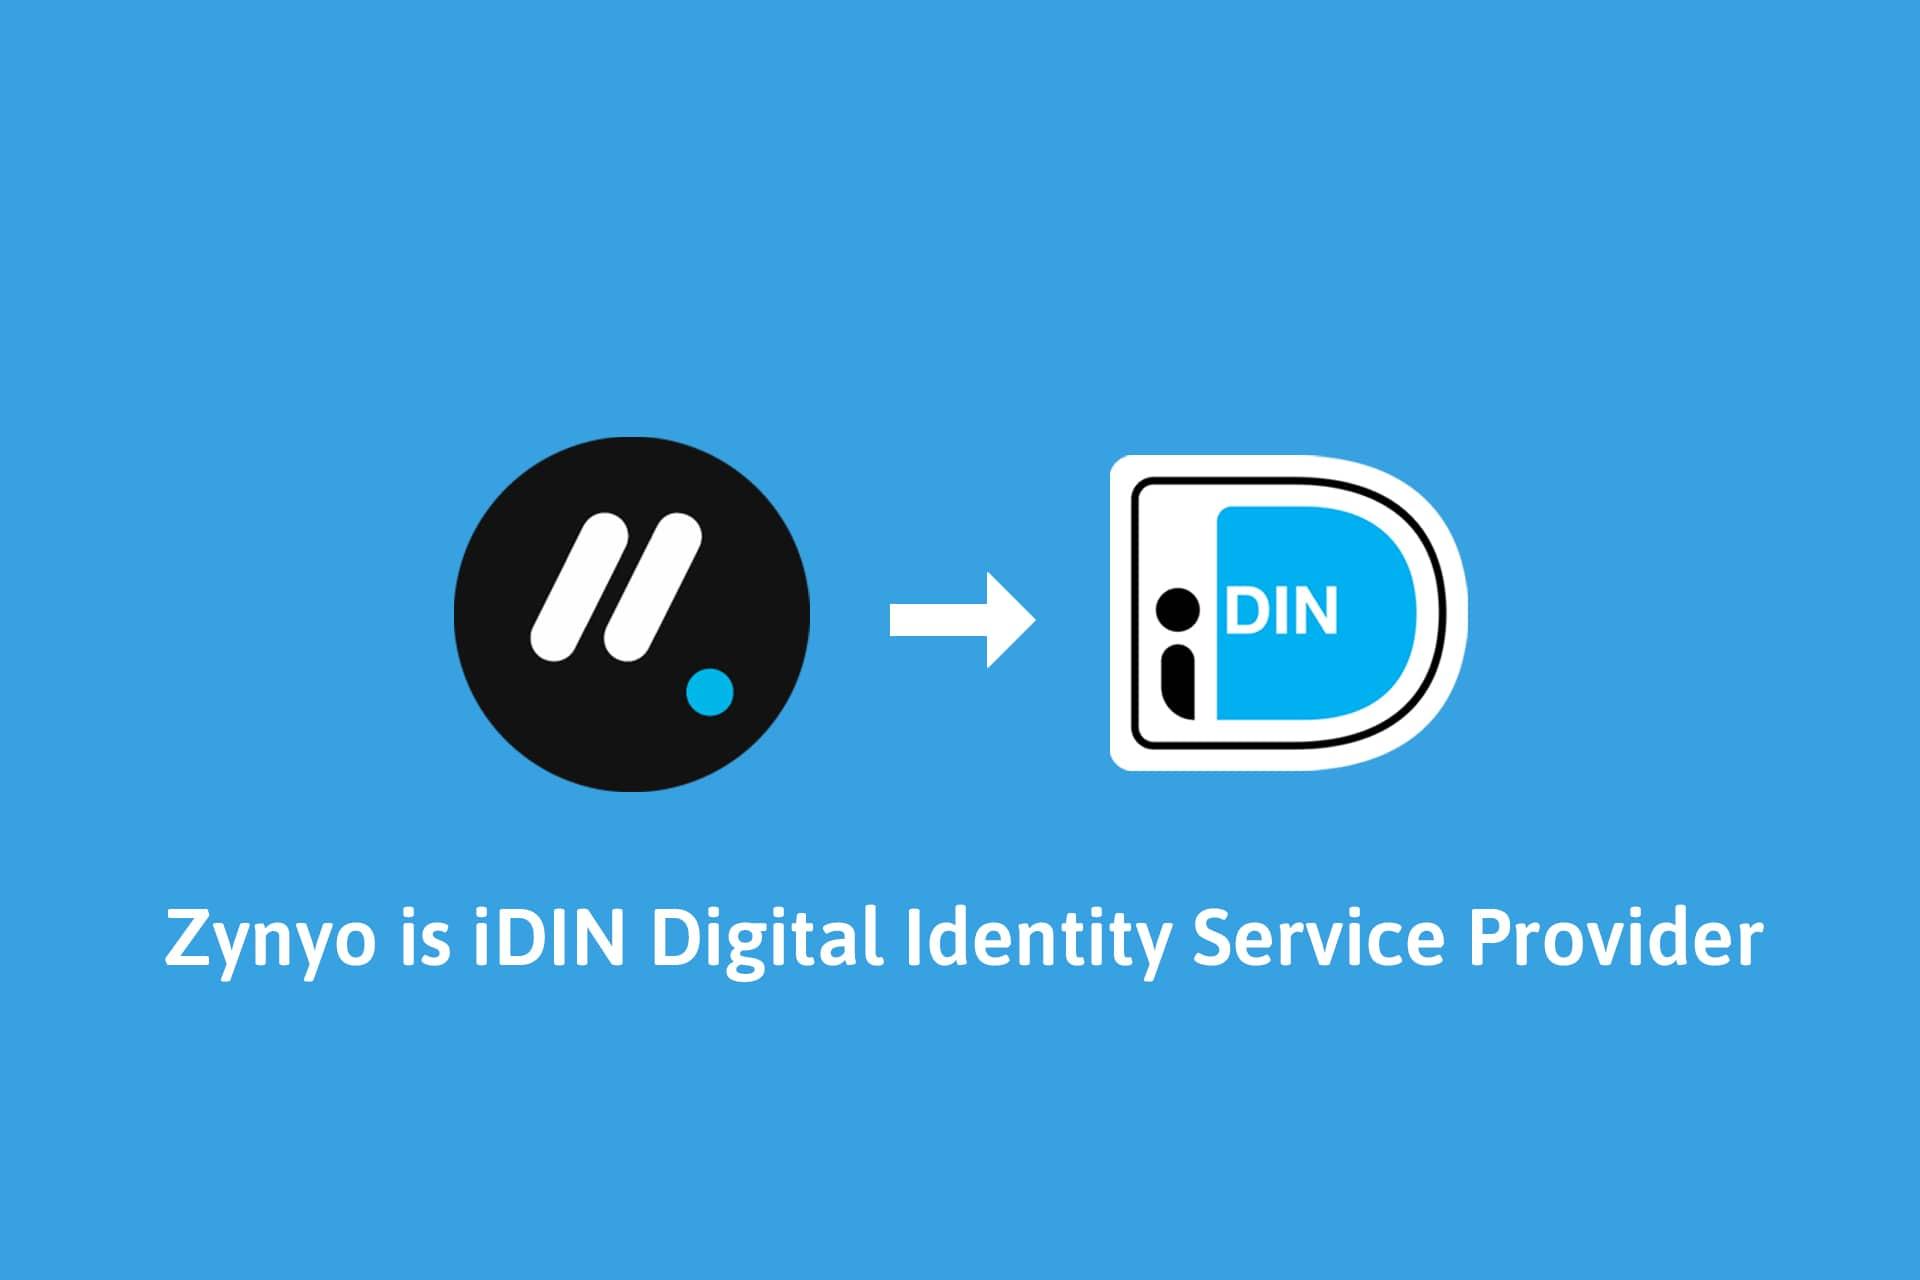 Zynyo is iDIN Digital Identity Service Provider